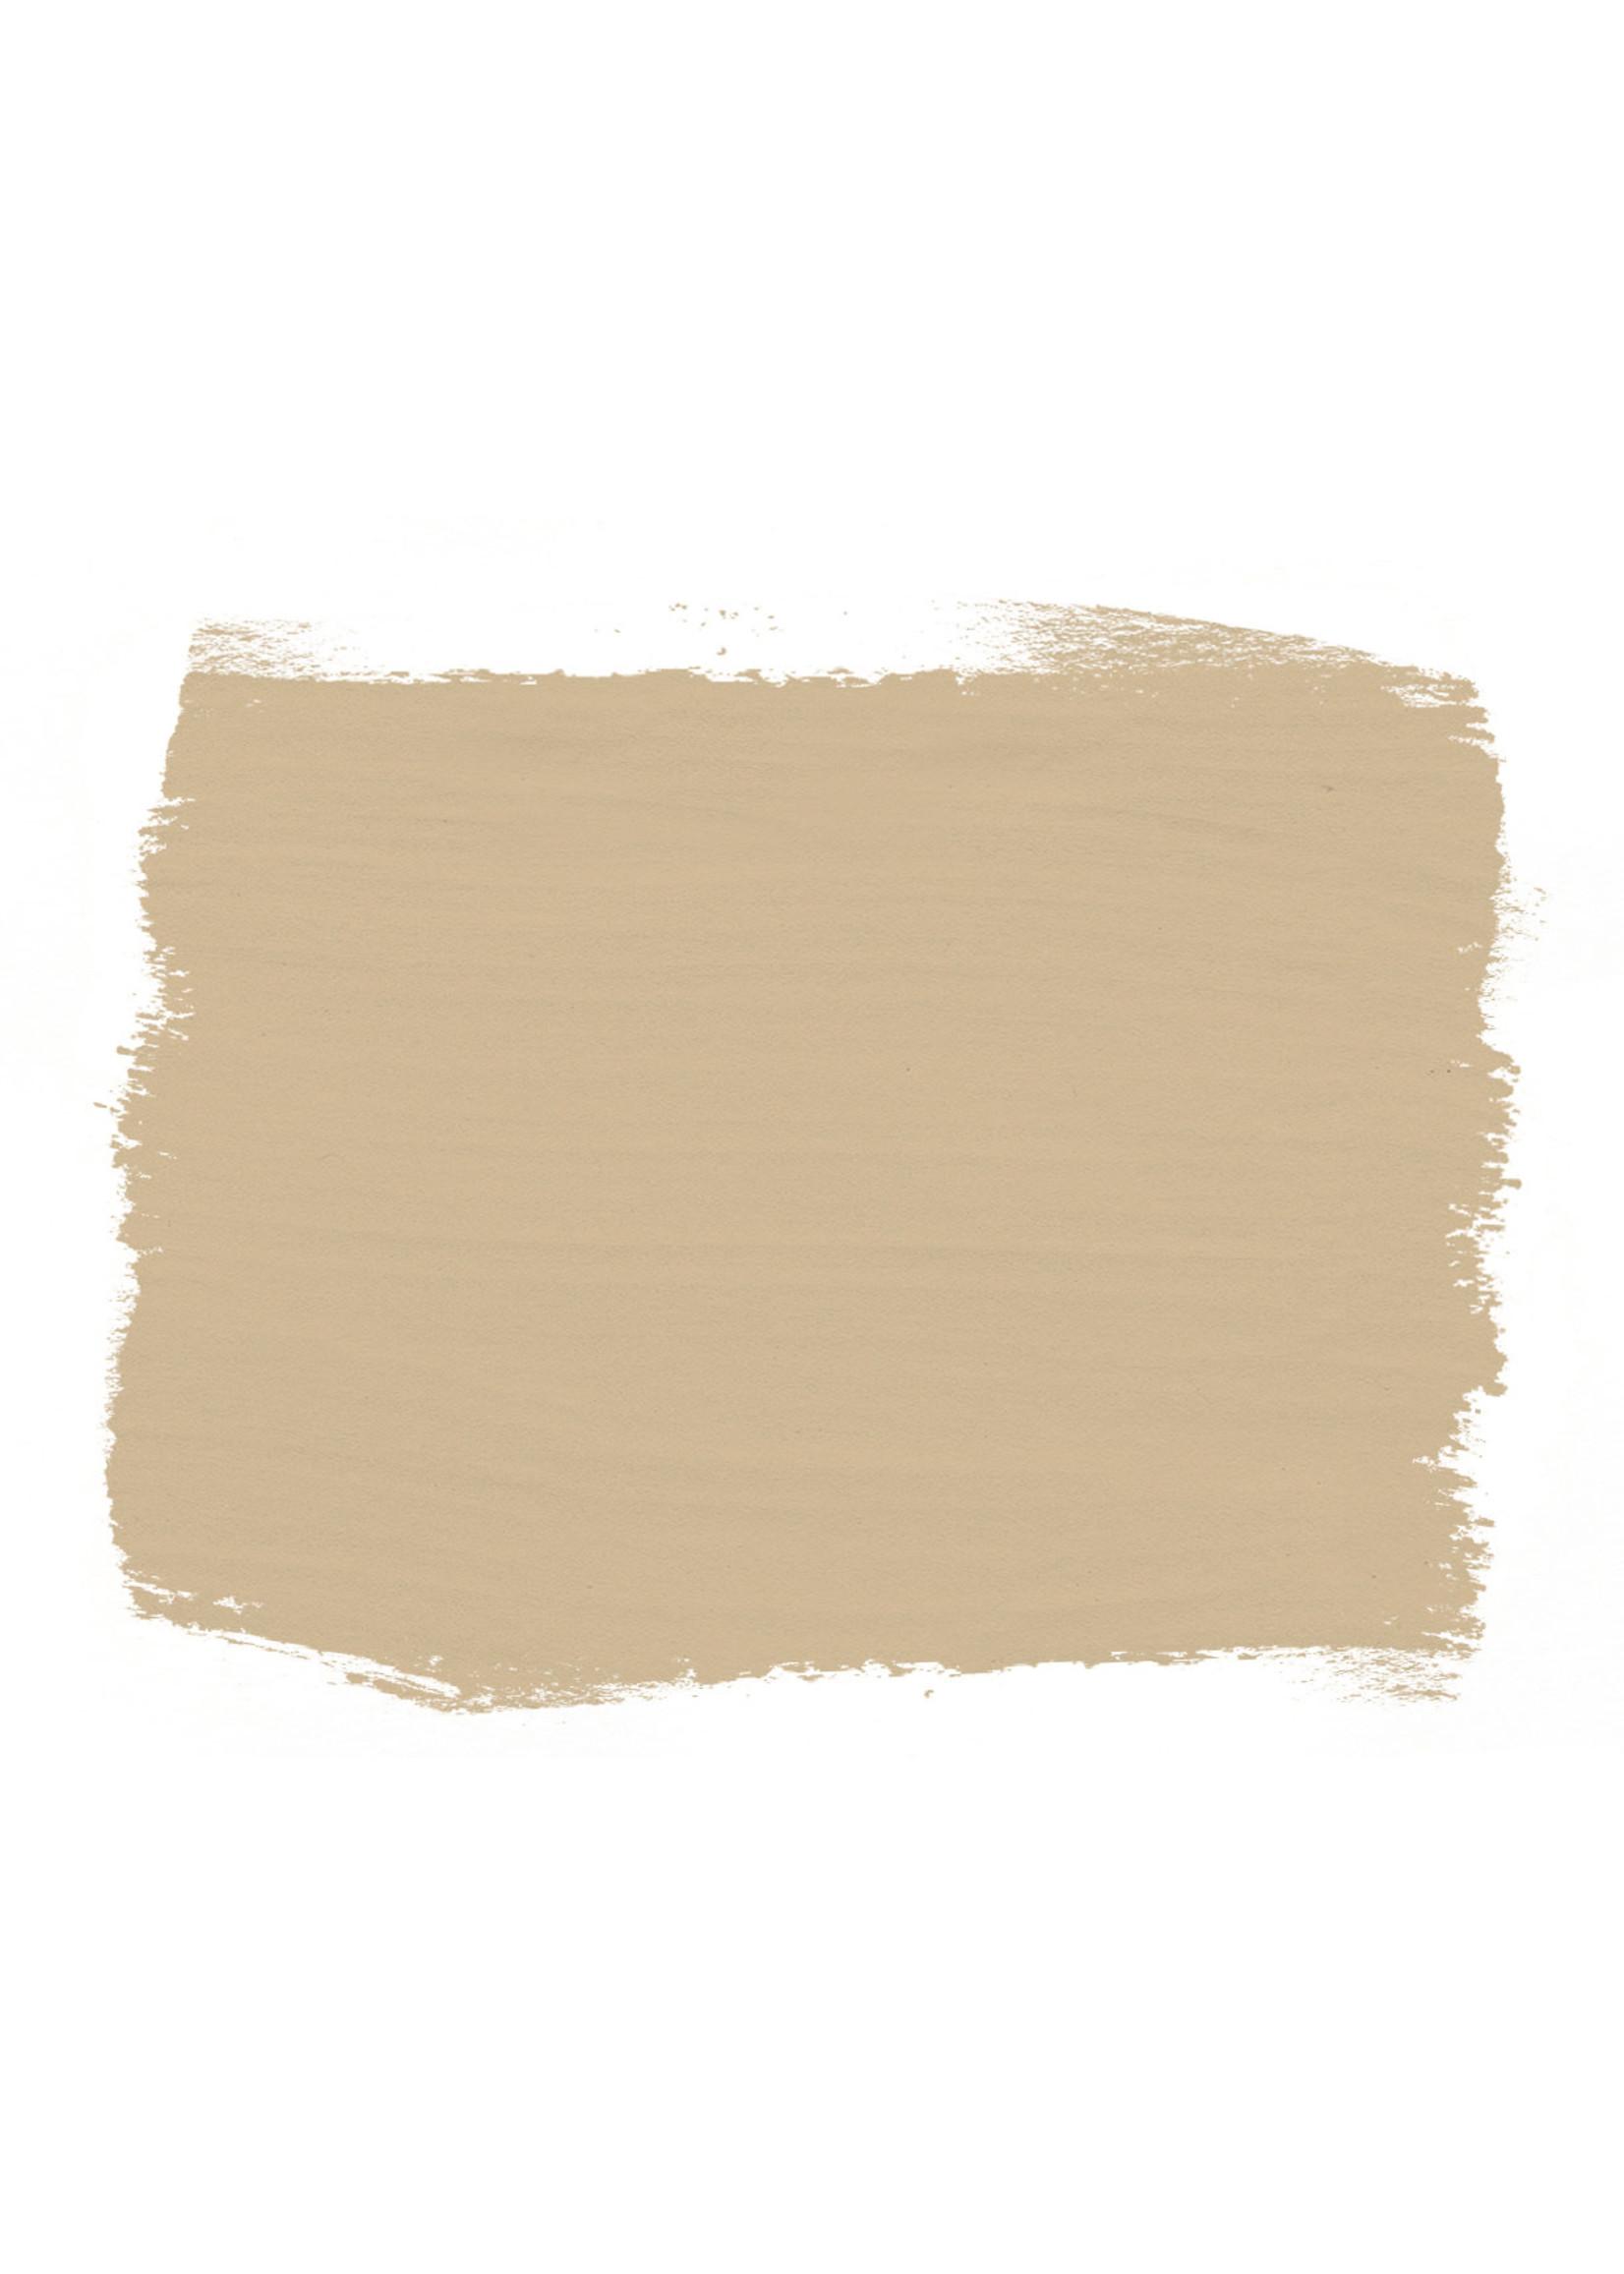 Annie Sloan Chalk Paint® Country Grey Annie Sloan Chalk Paint ®